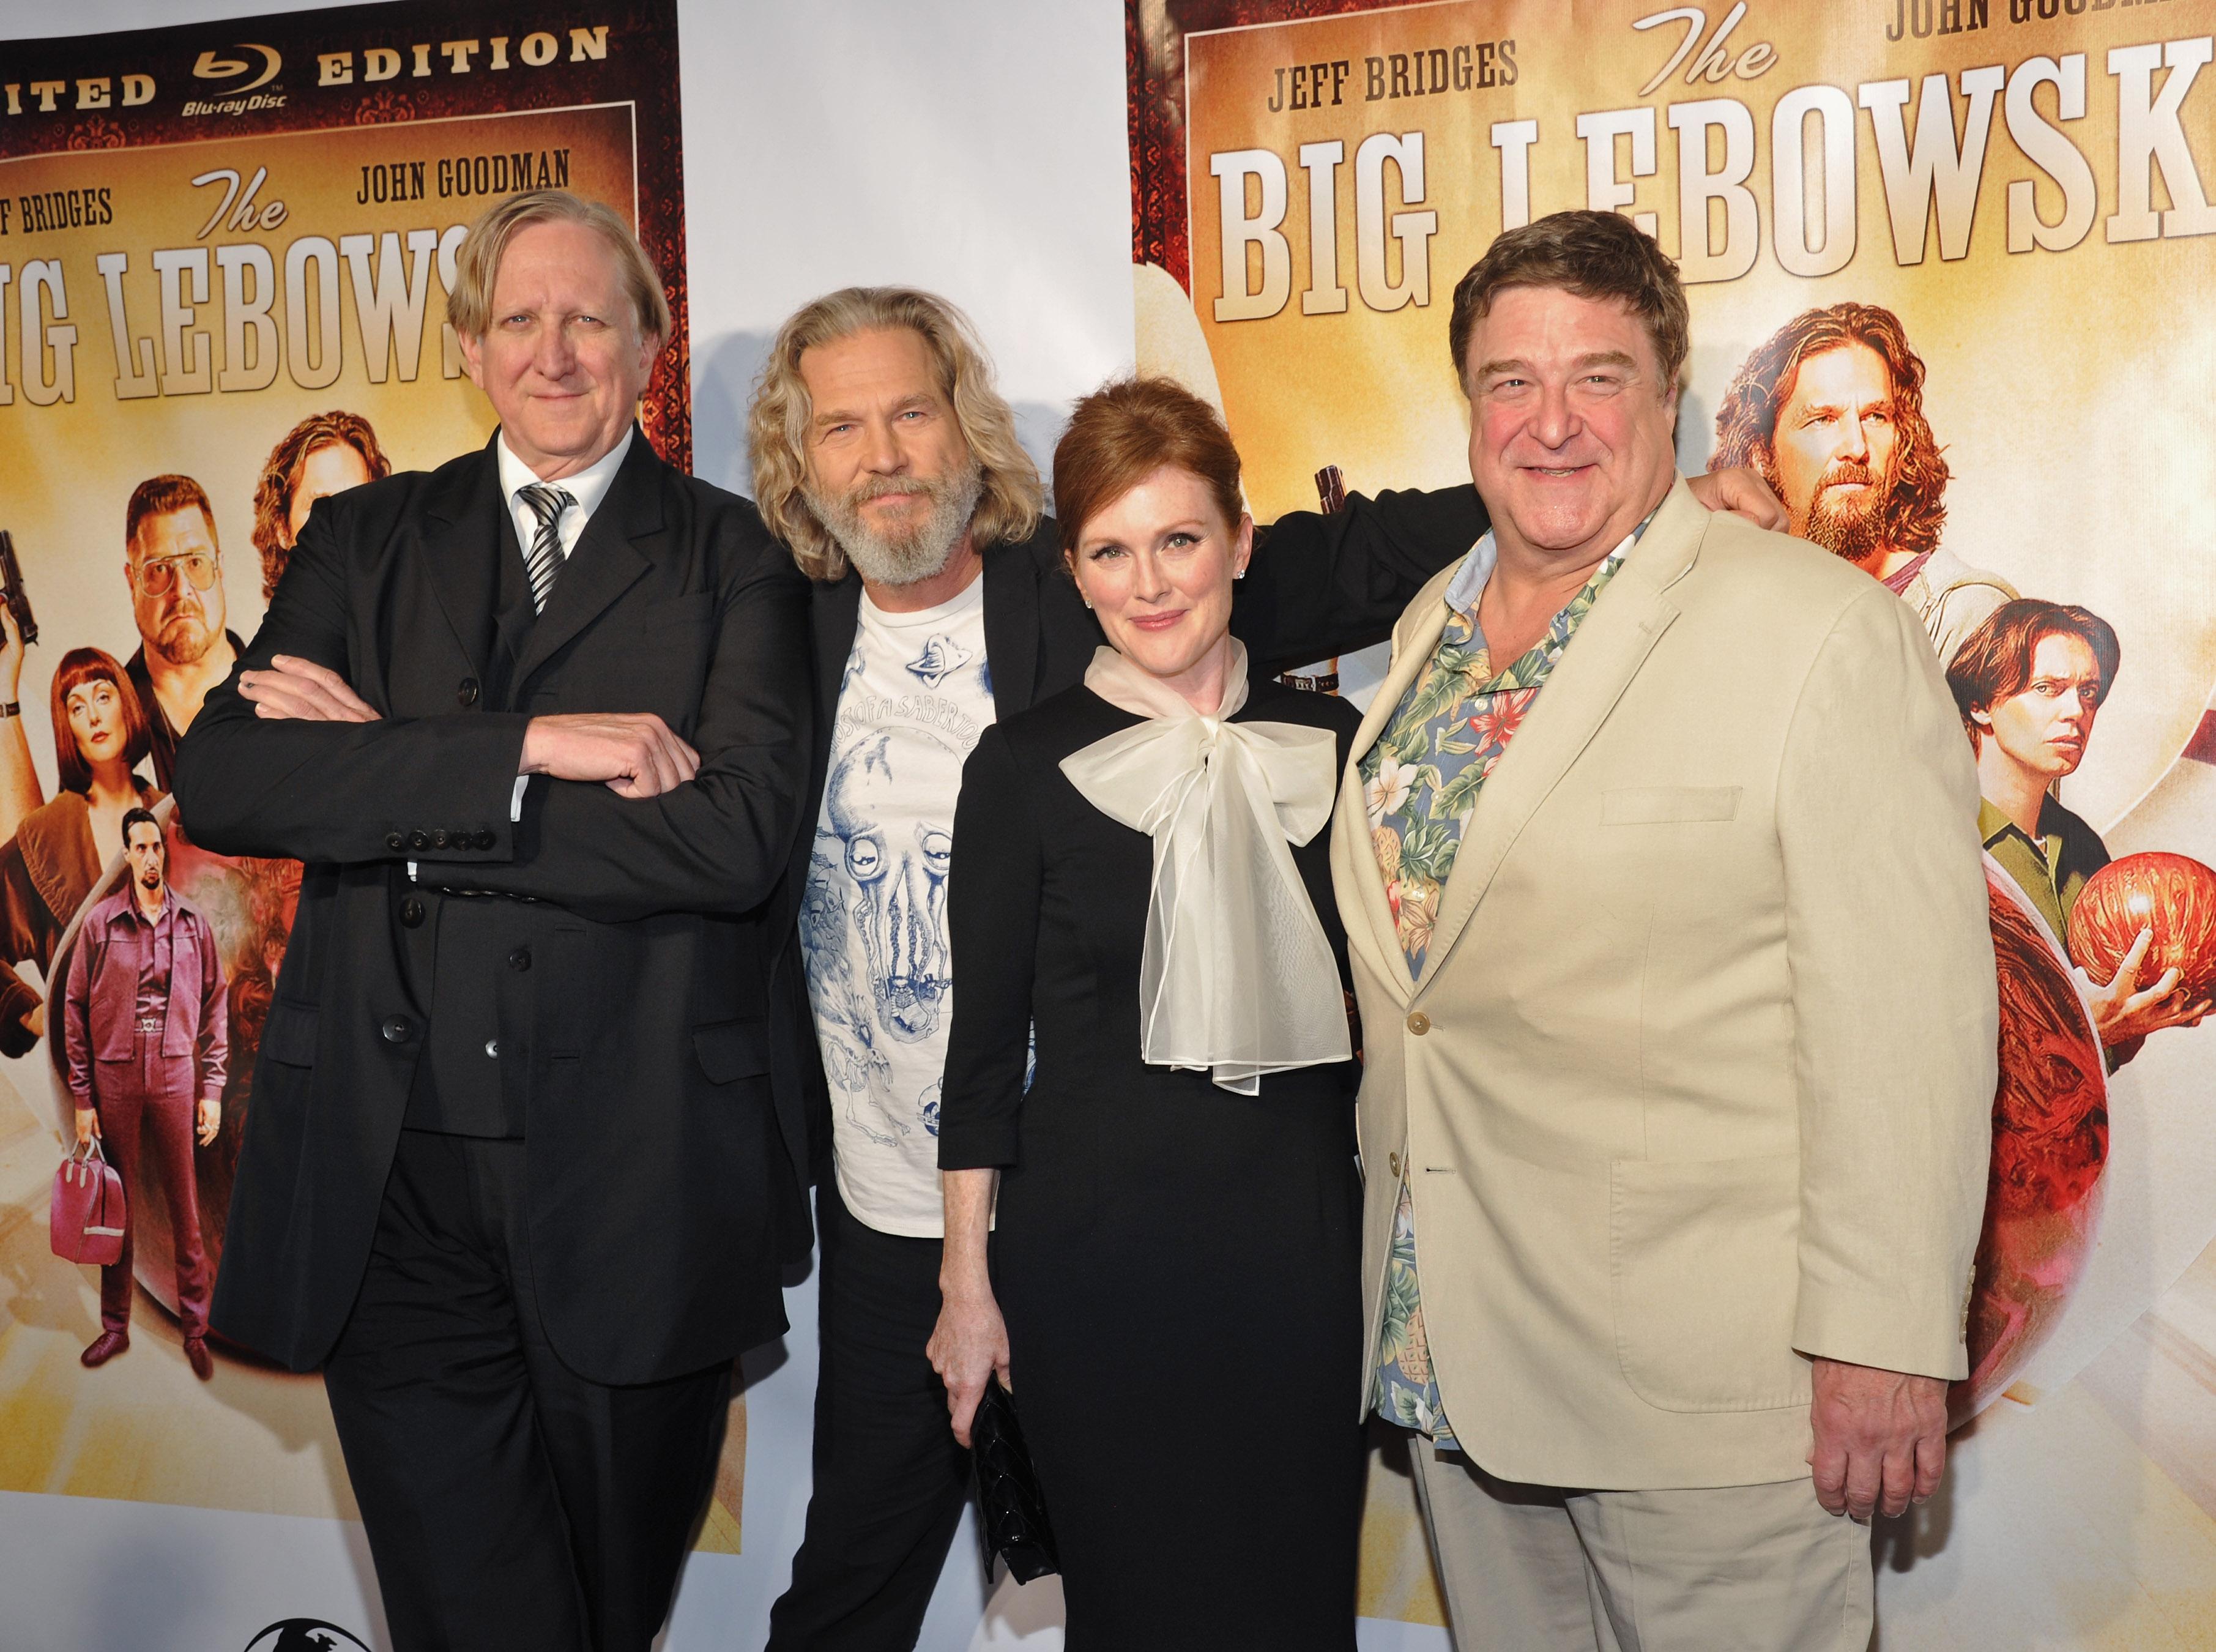 'The Big Lebowski' Blu-Ray Release